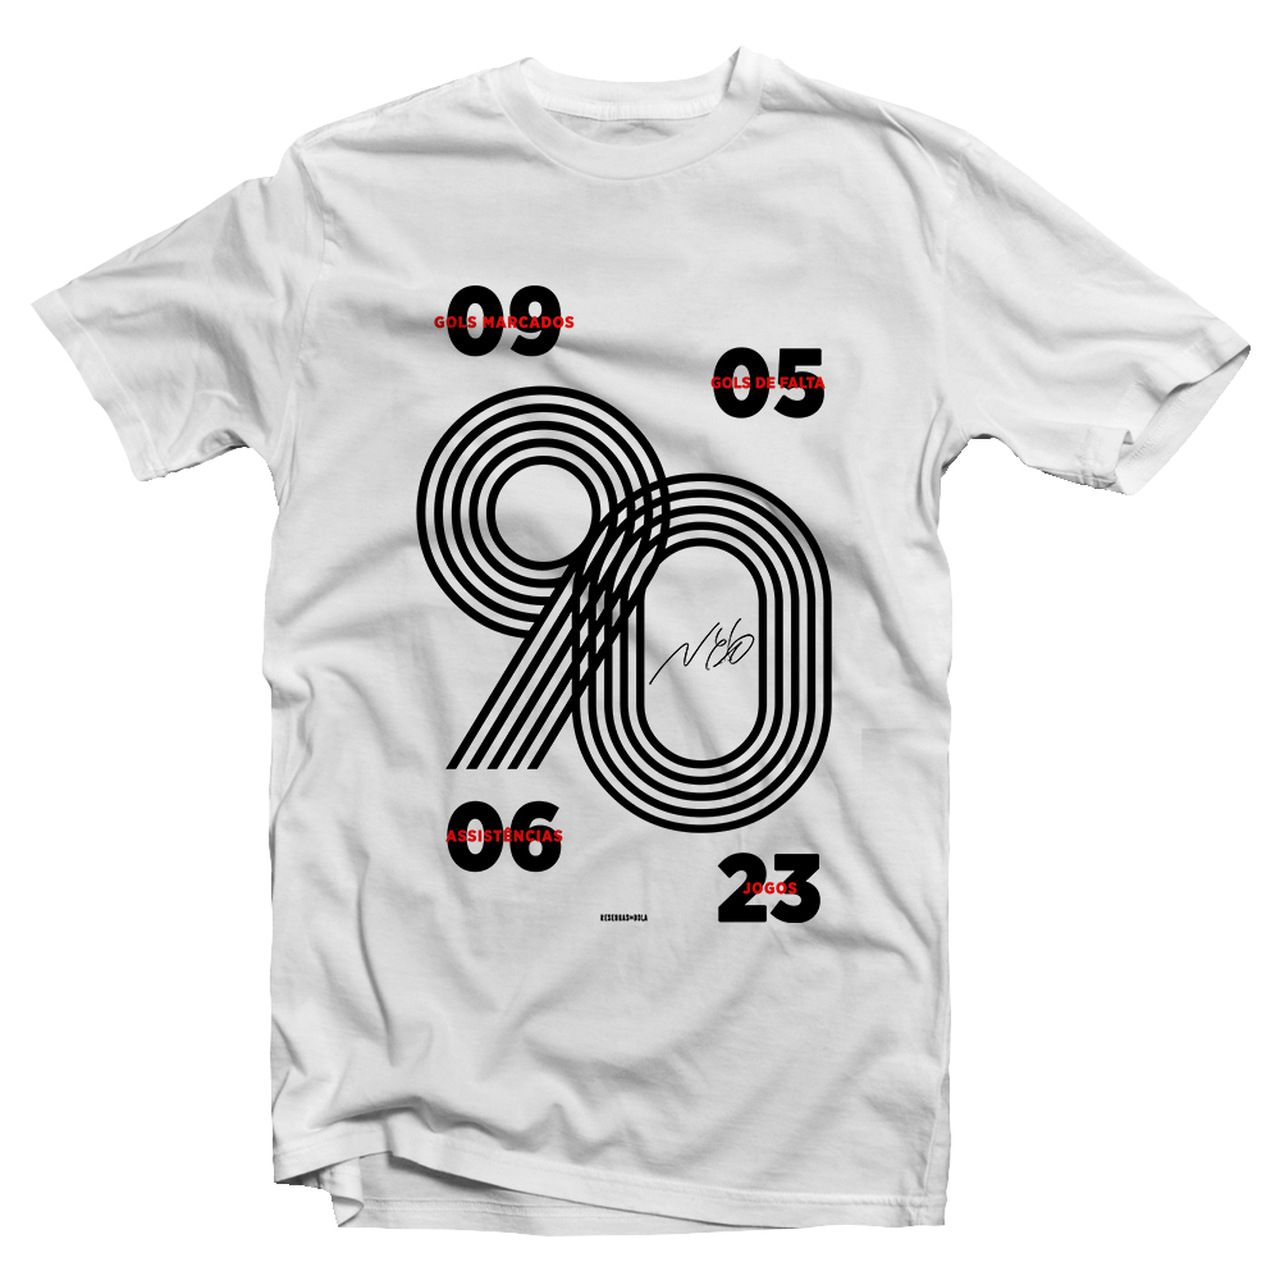 Camiseta - NETO 1990. Masculino